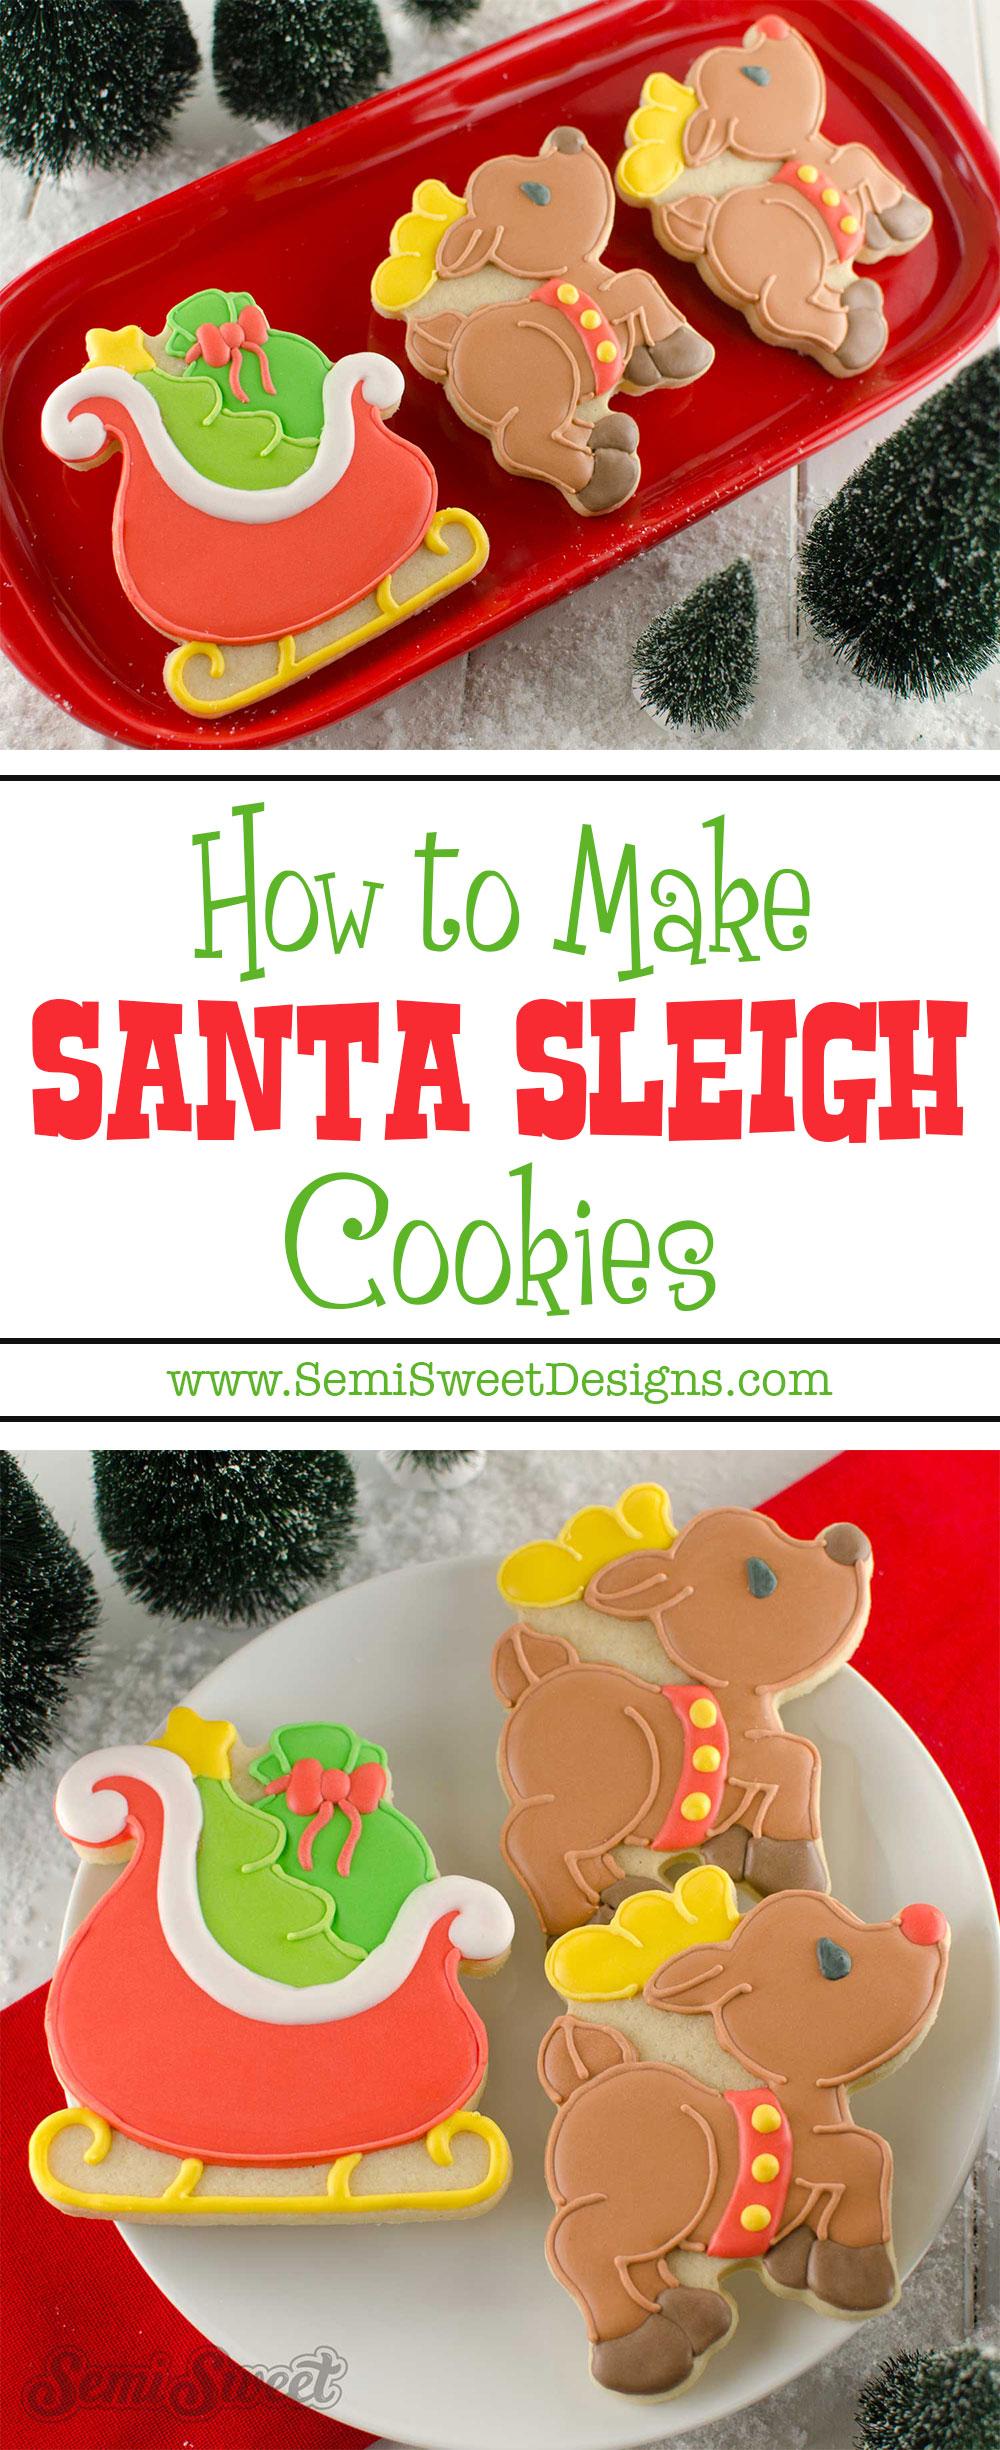 How To Make Santa Sleigh Cookies